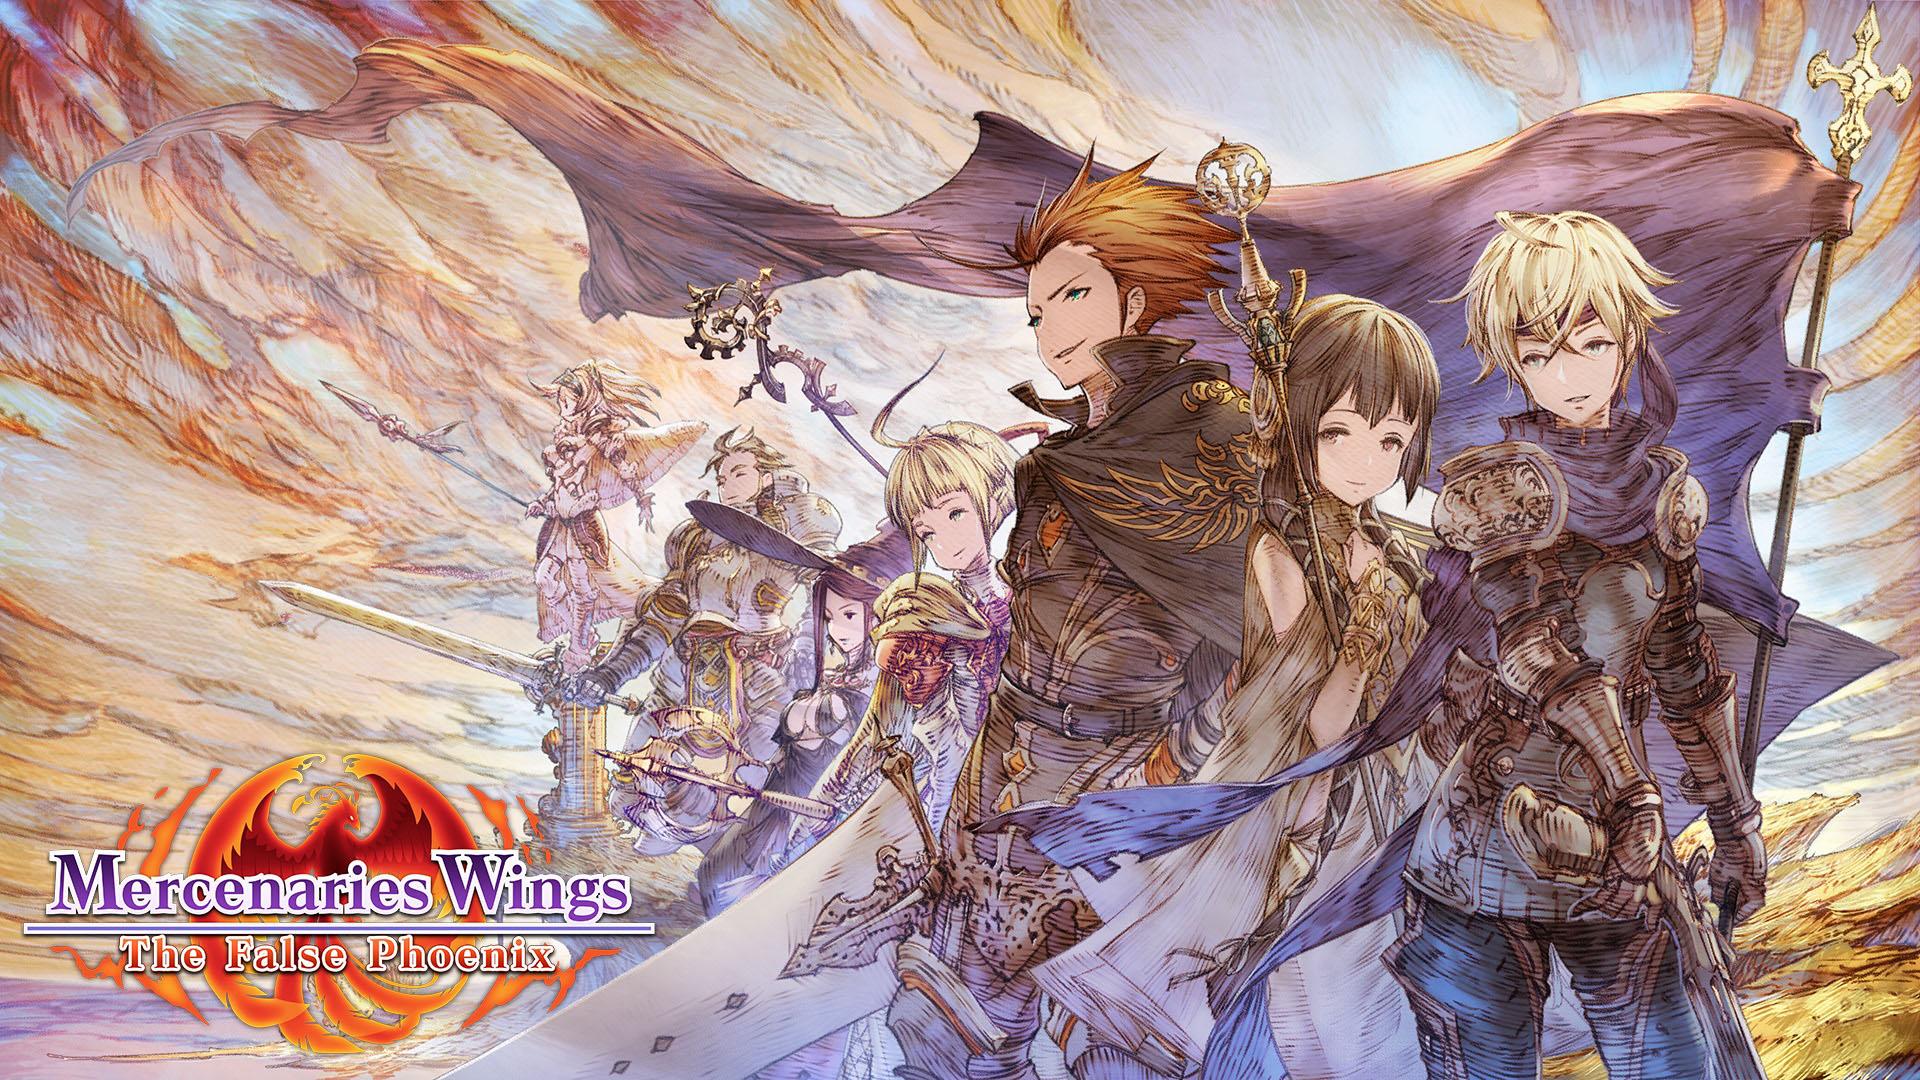 Mercenaries Wings: The False Phoenix Western será lançado em novembro de 2018